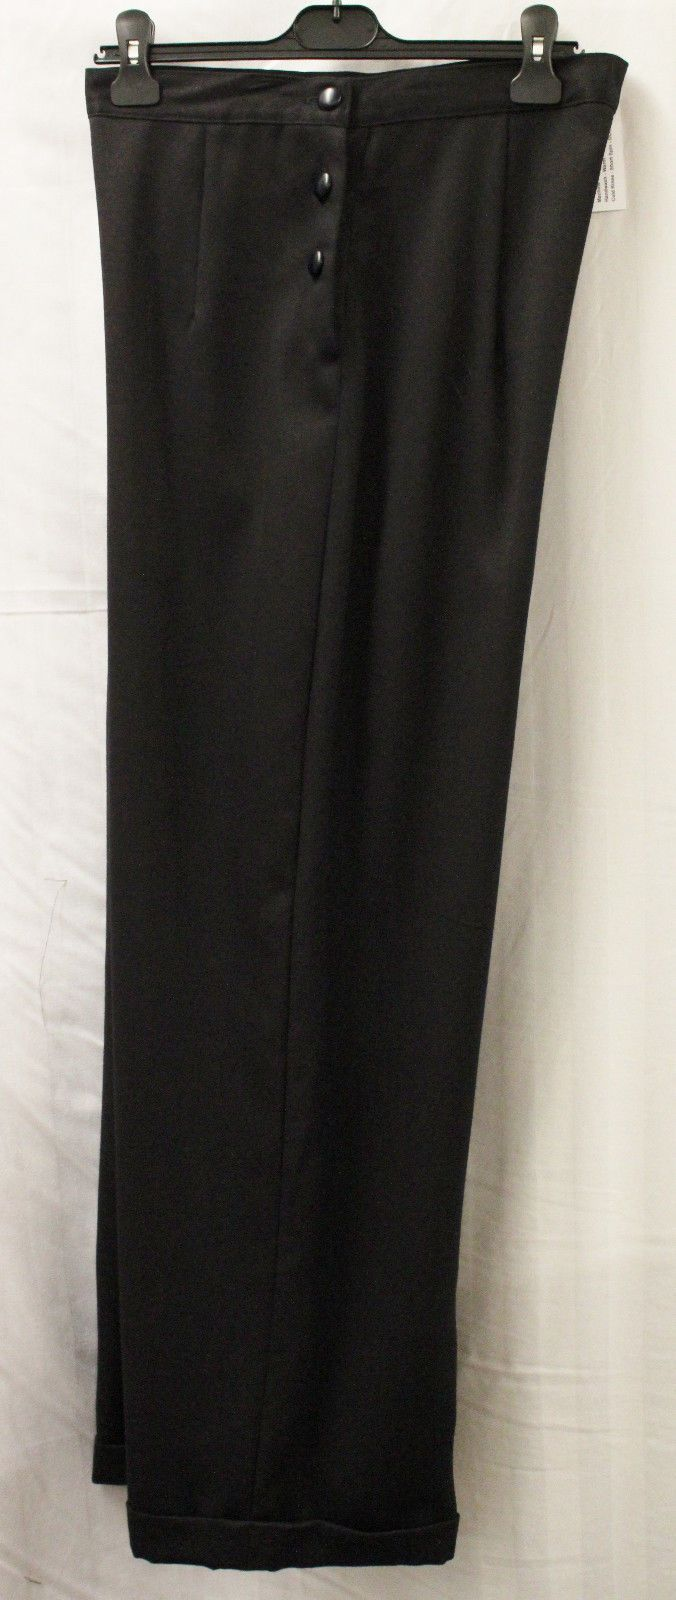 Day reenactment ww ii pictures pinterest - Womens 1940s High Waist Wide Leg Black Trousers Wwii Ww2 Reenactment Lindy